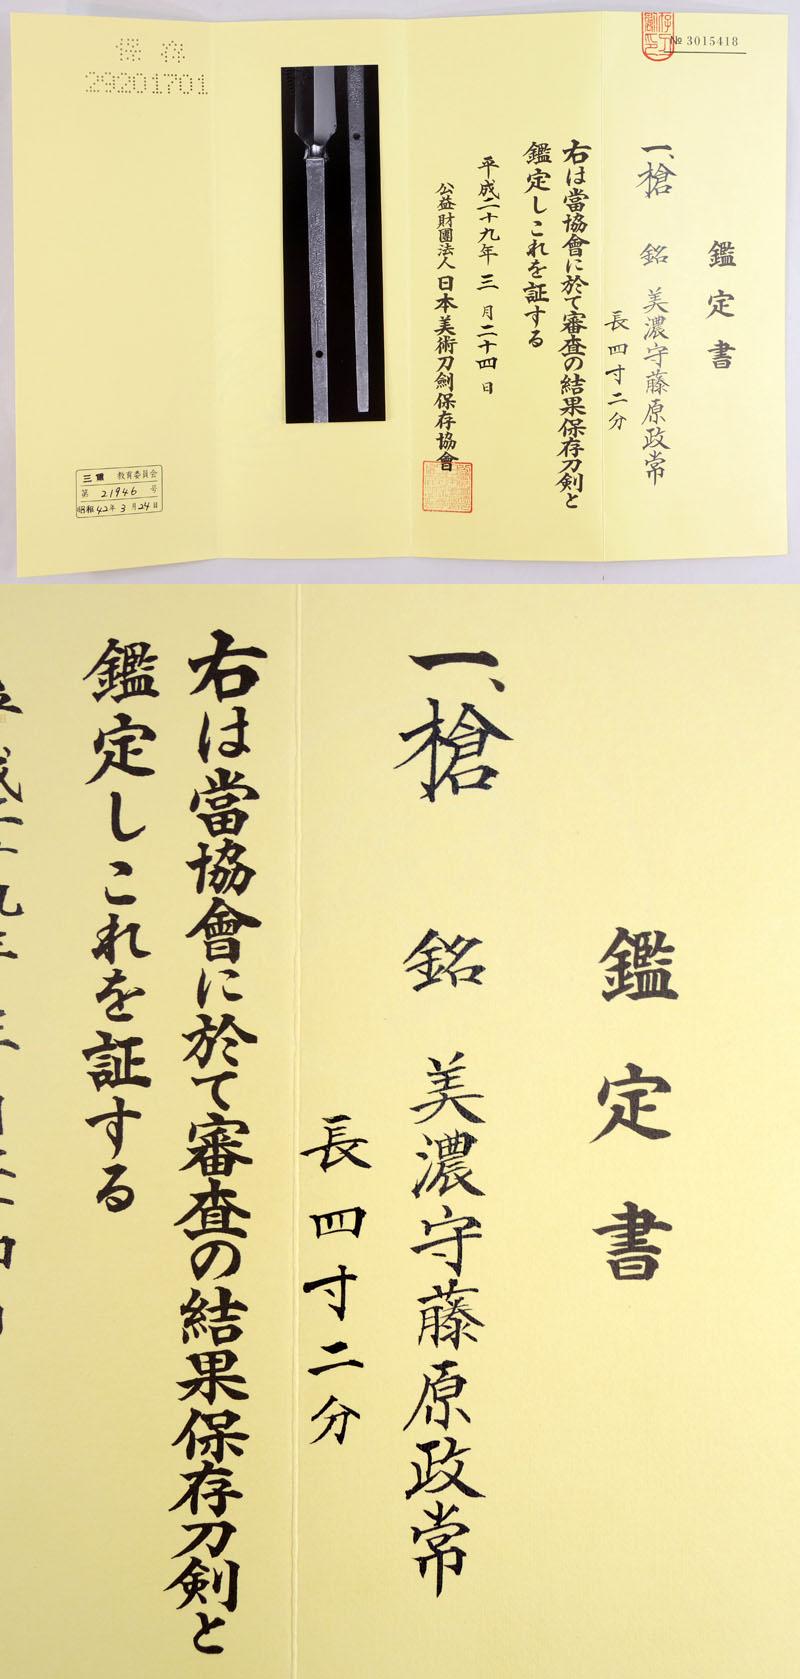 美濃守藤原政常(三代) Picture of Certificate